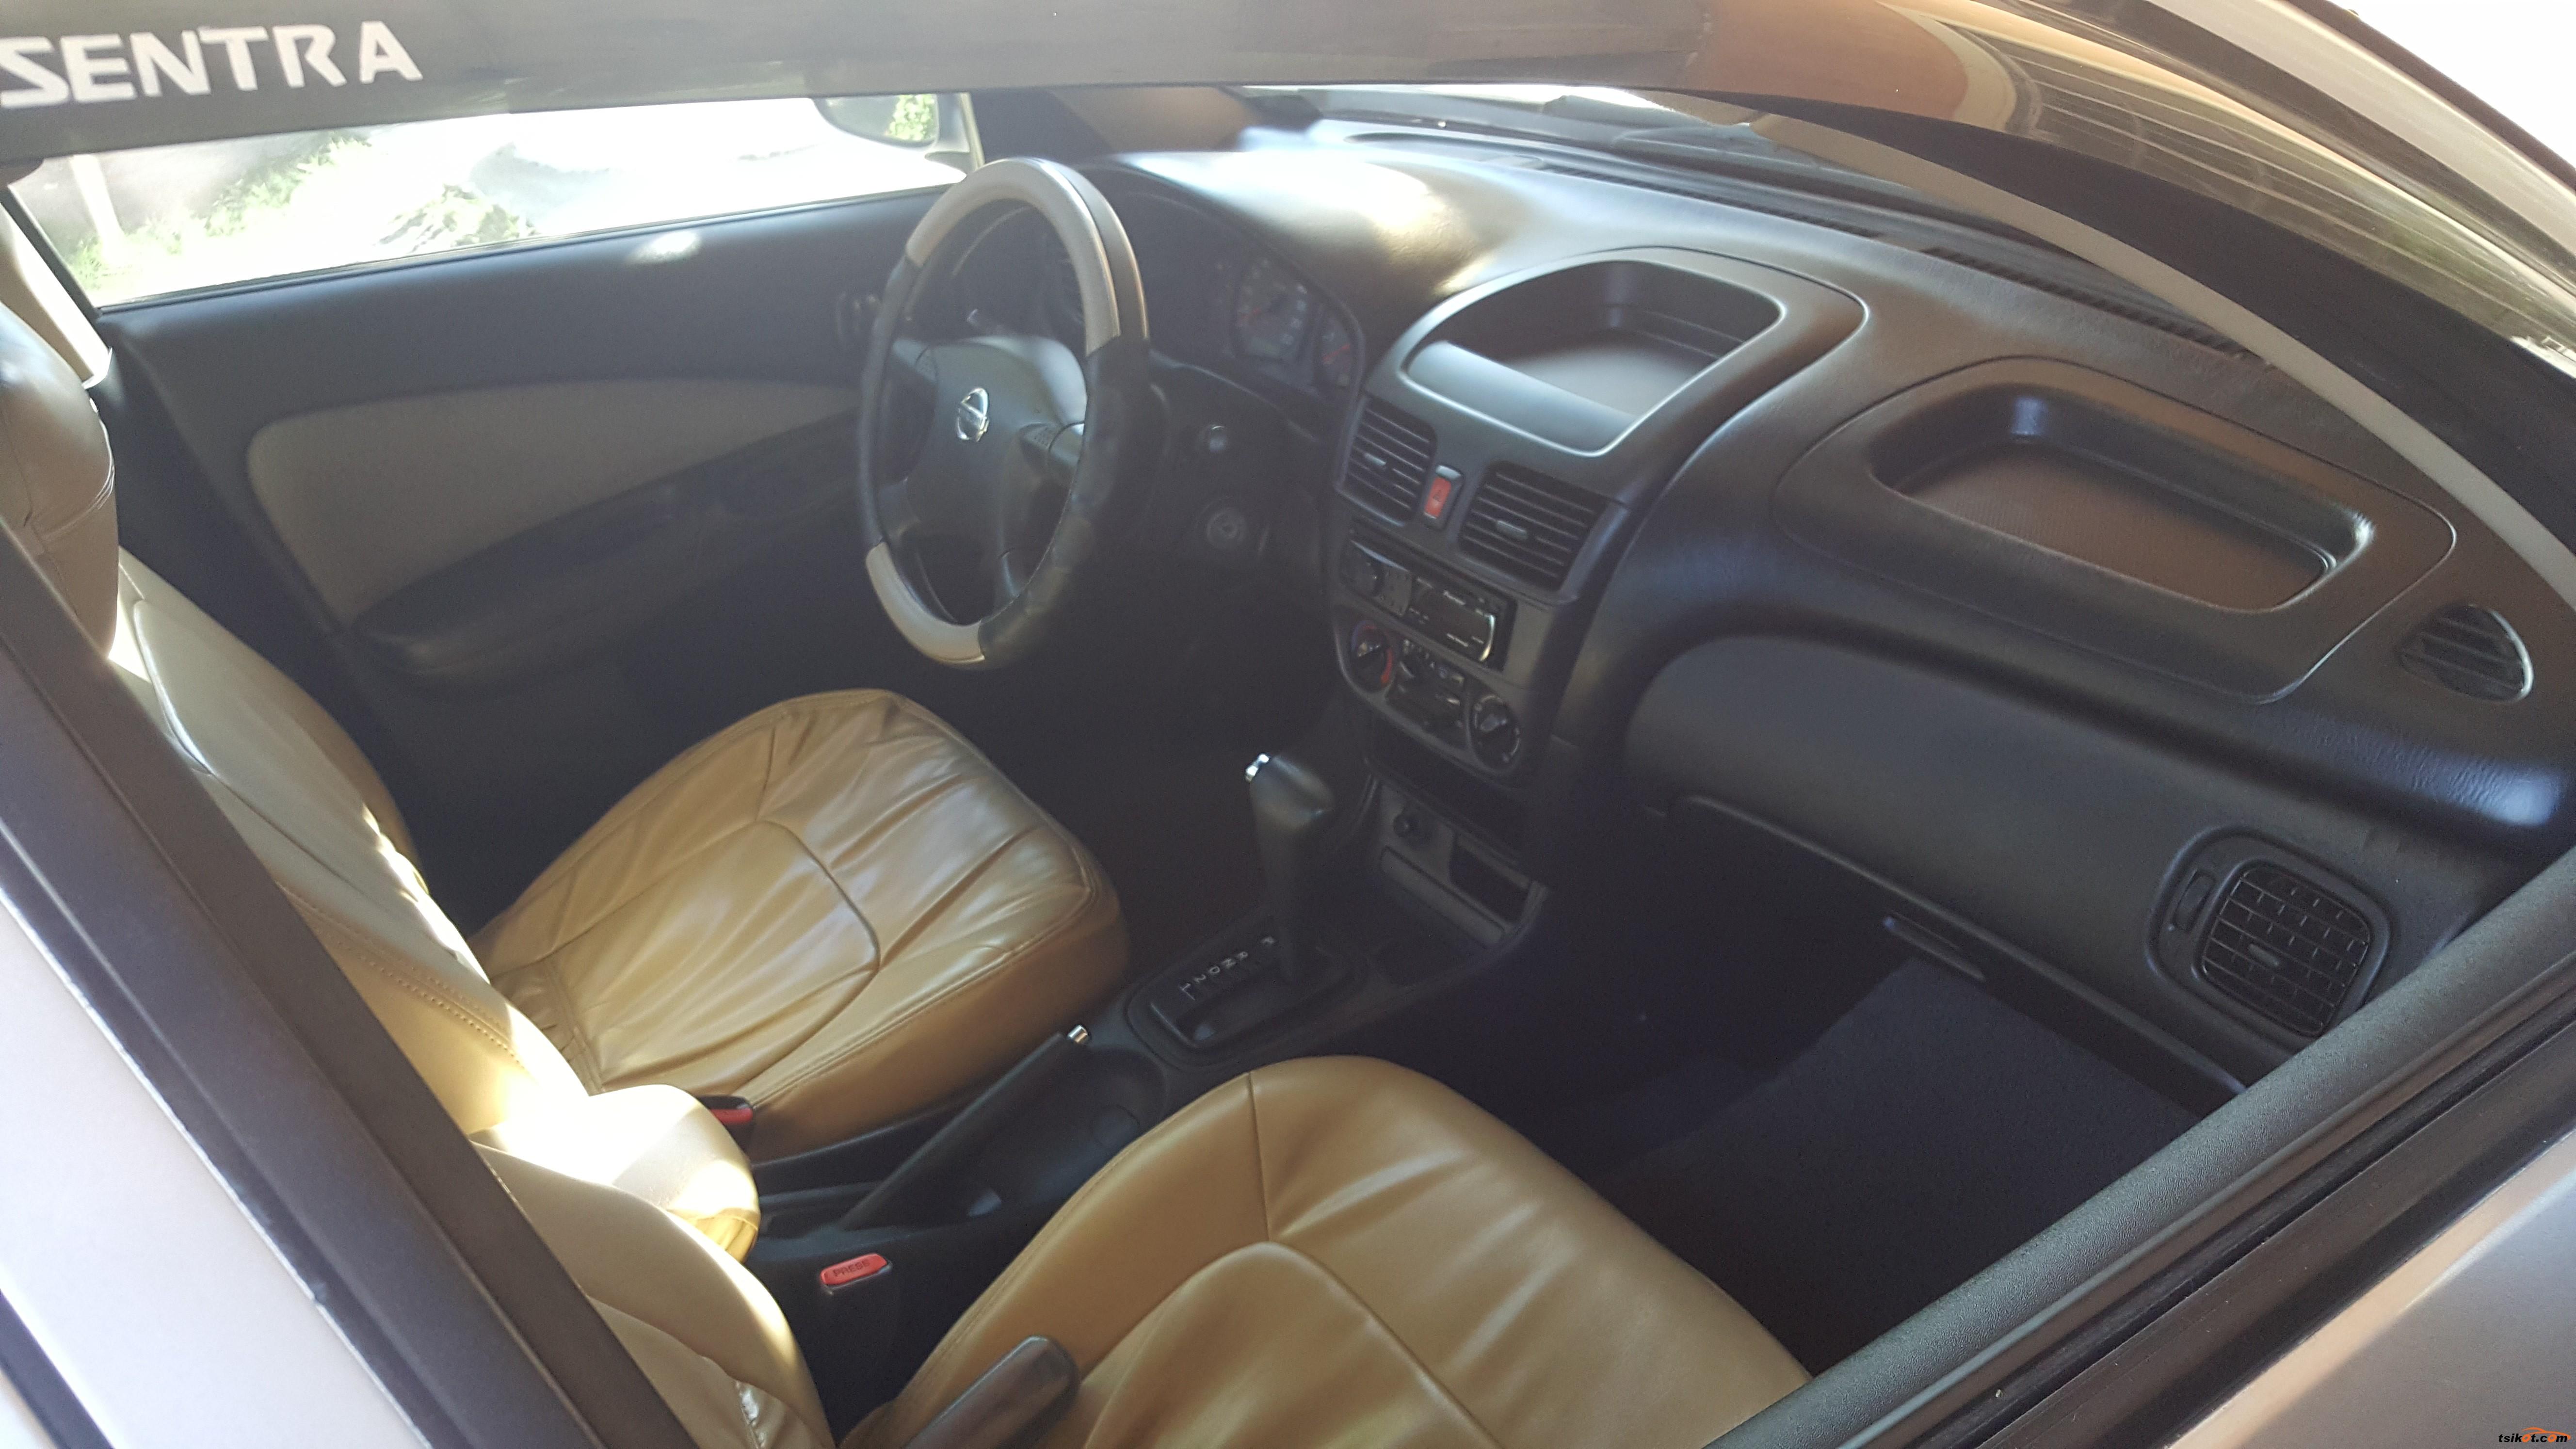 Nissan Sentra 2008 - 6